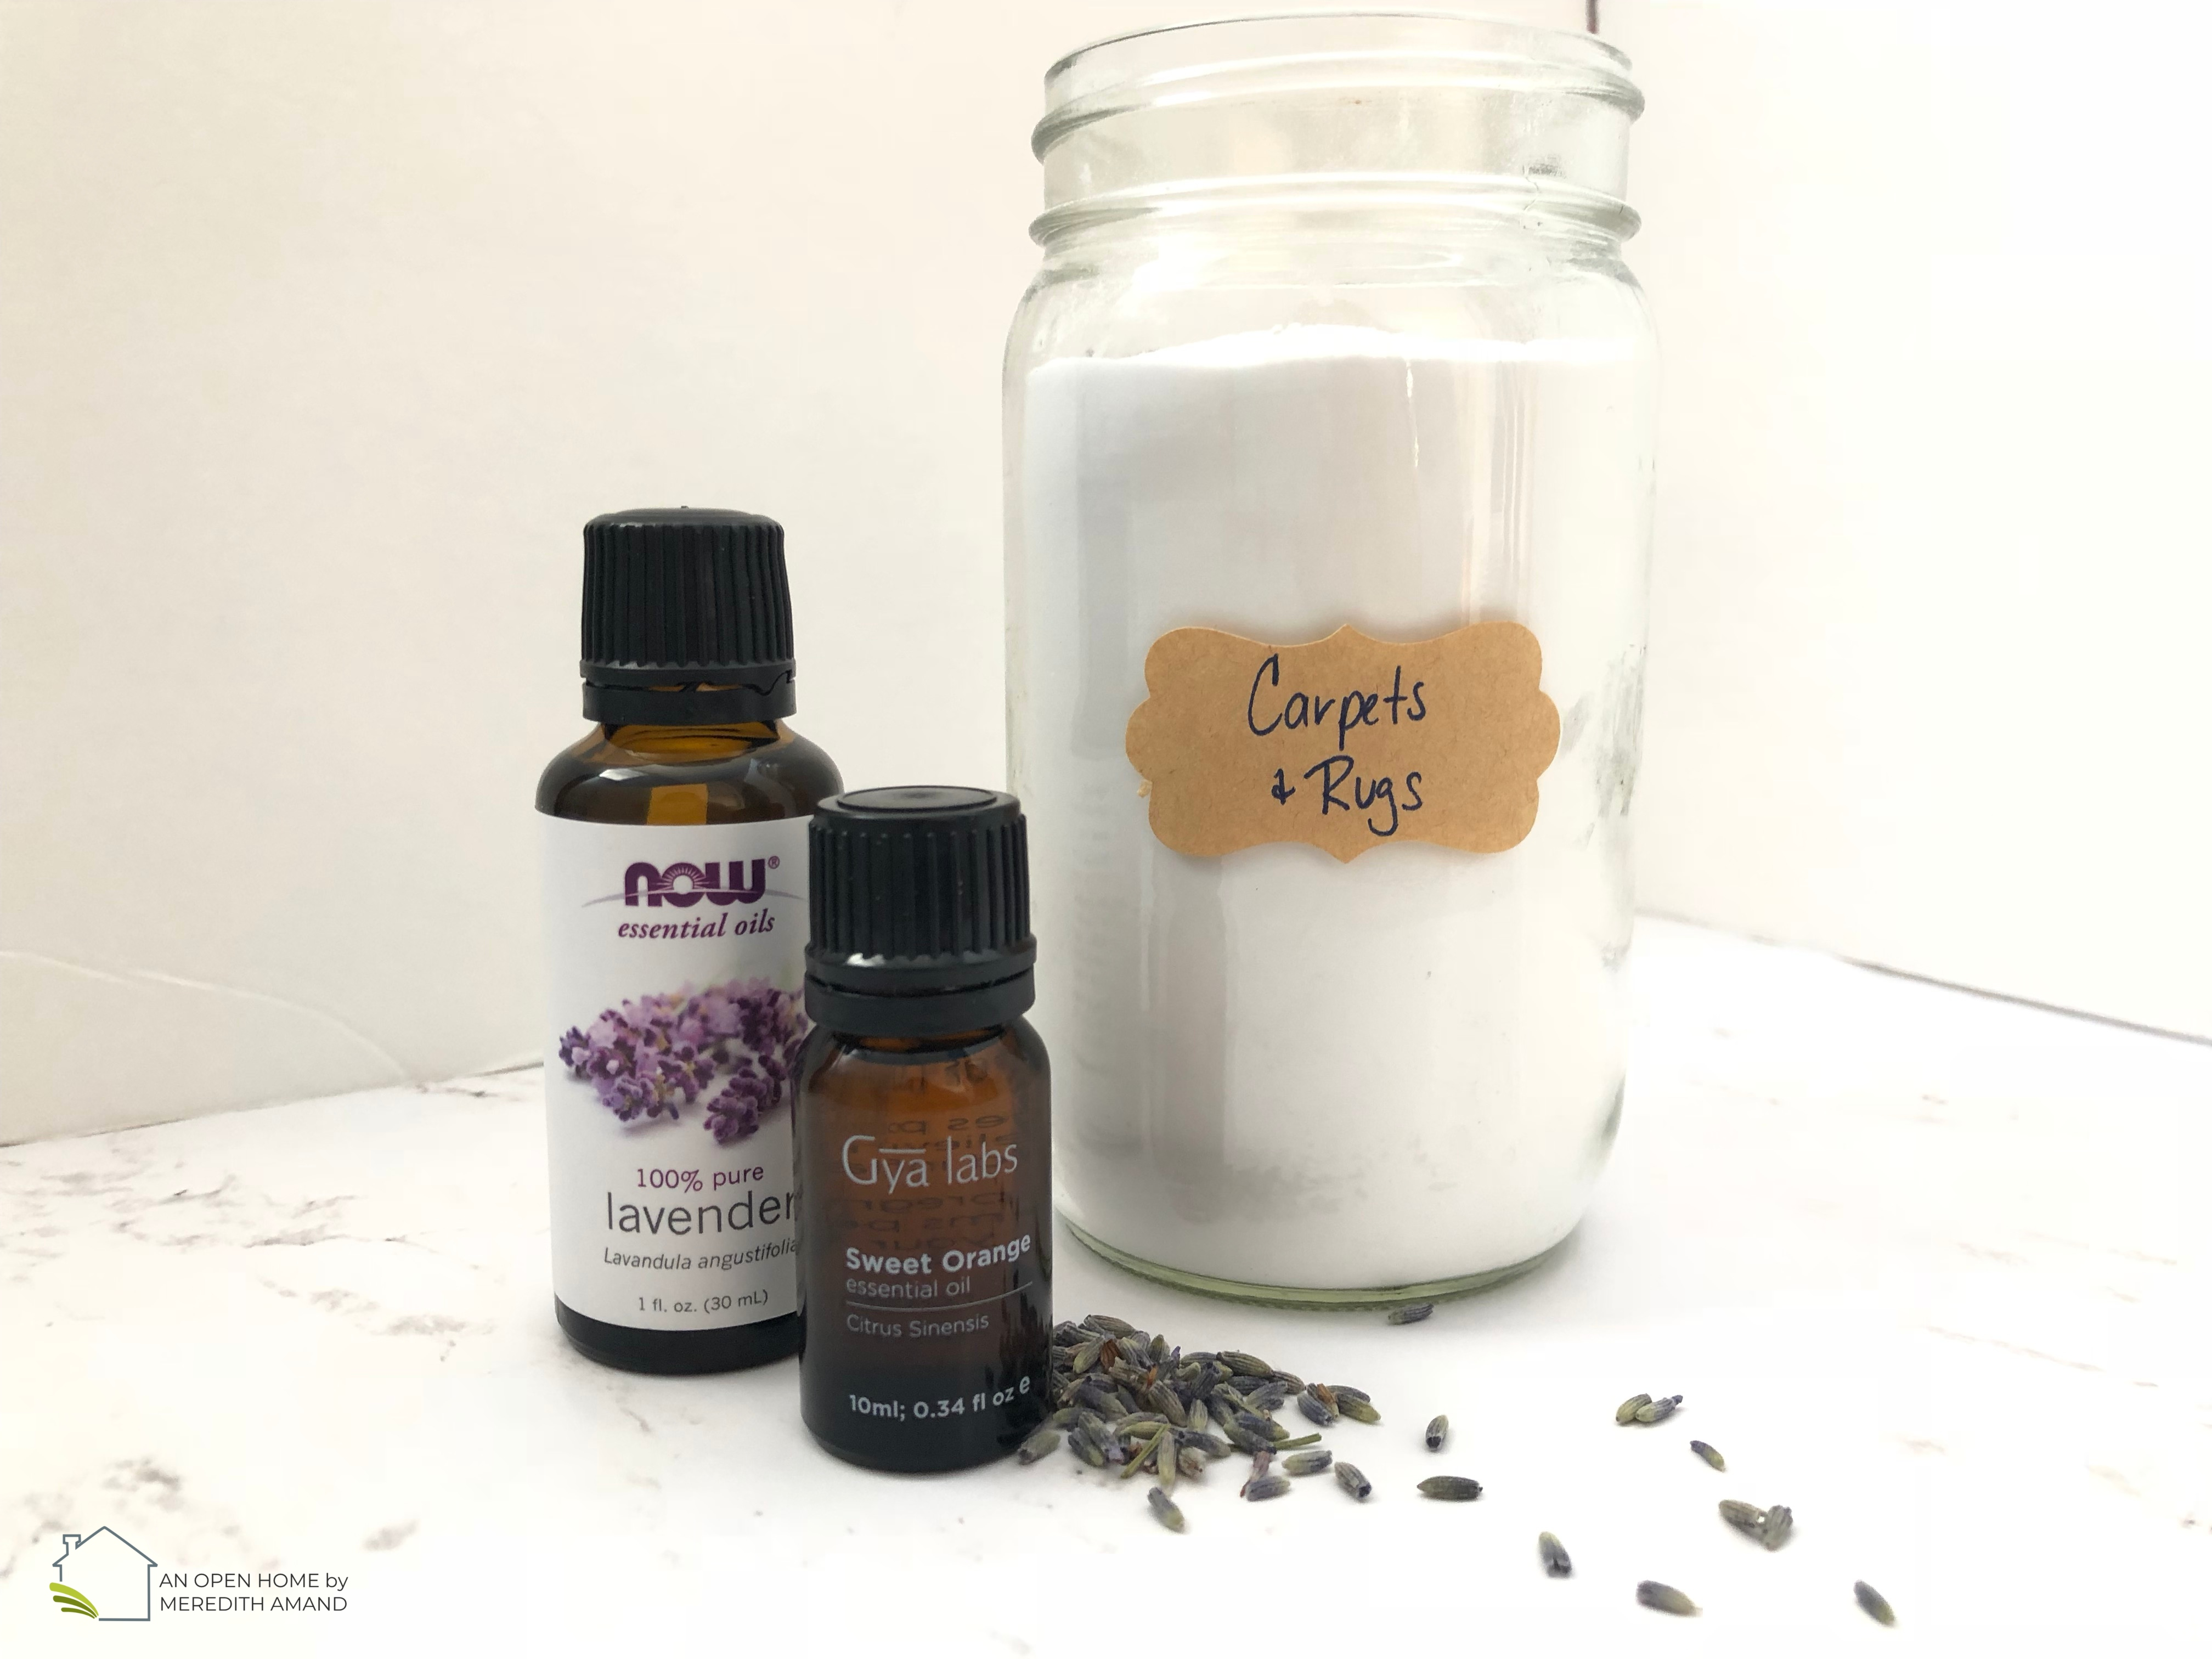 Carpet Deodorizer with Essential Oils